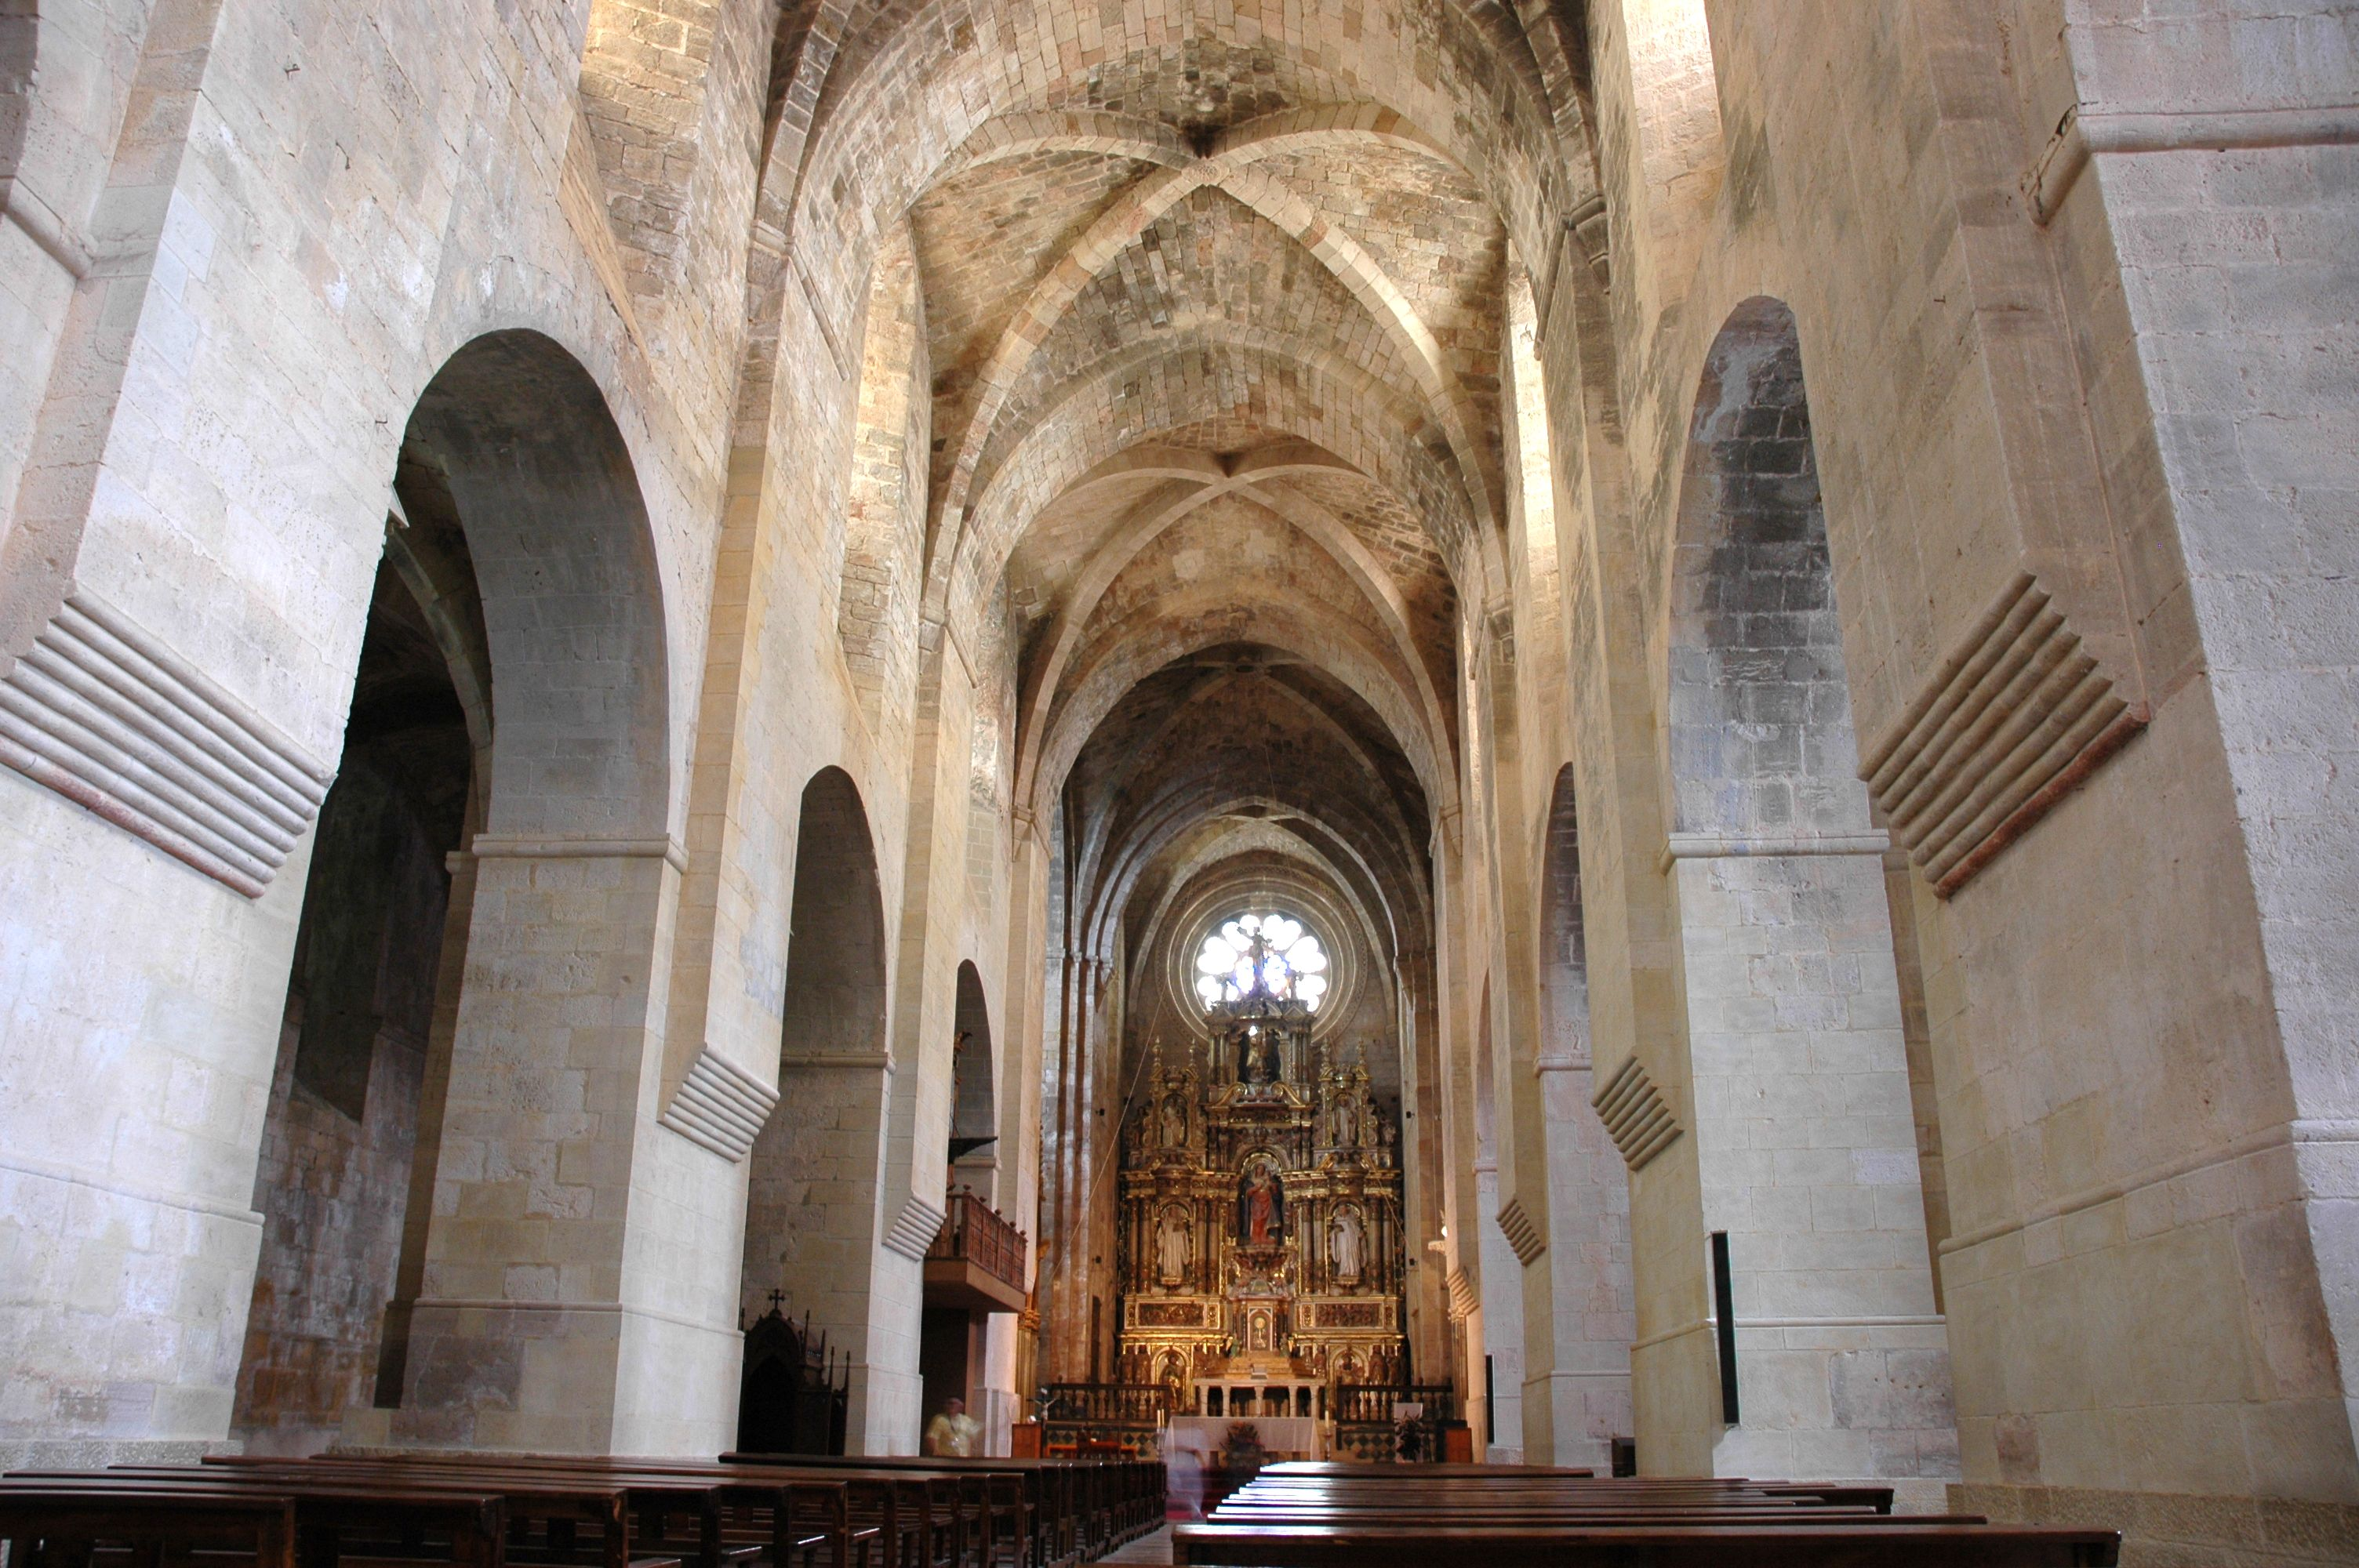 File:Monestir de Santes Creus - Interior església.JPG - Wikimedia Commons